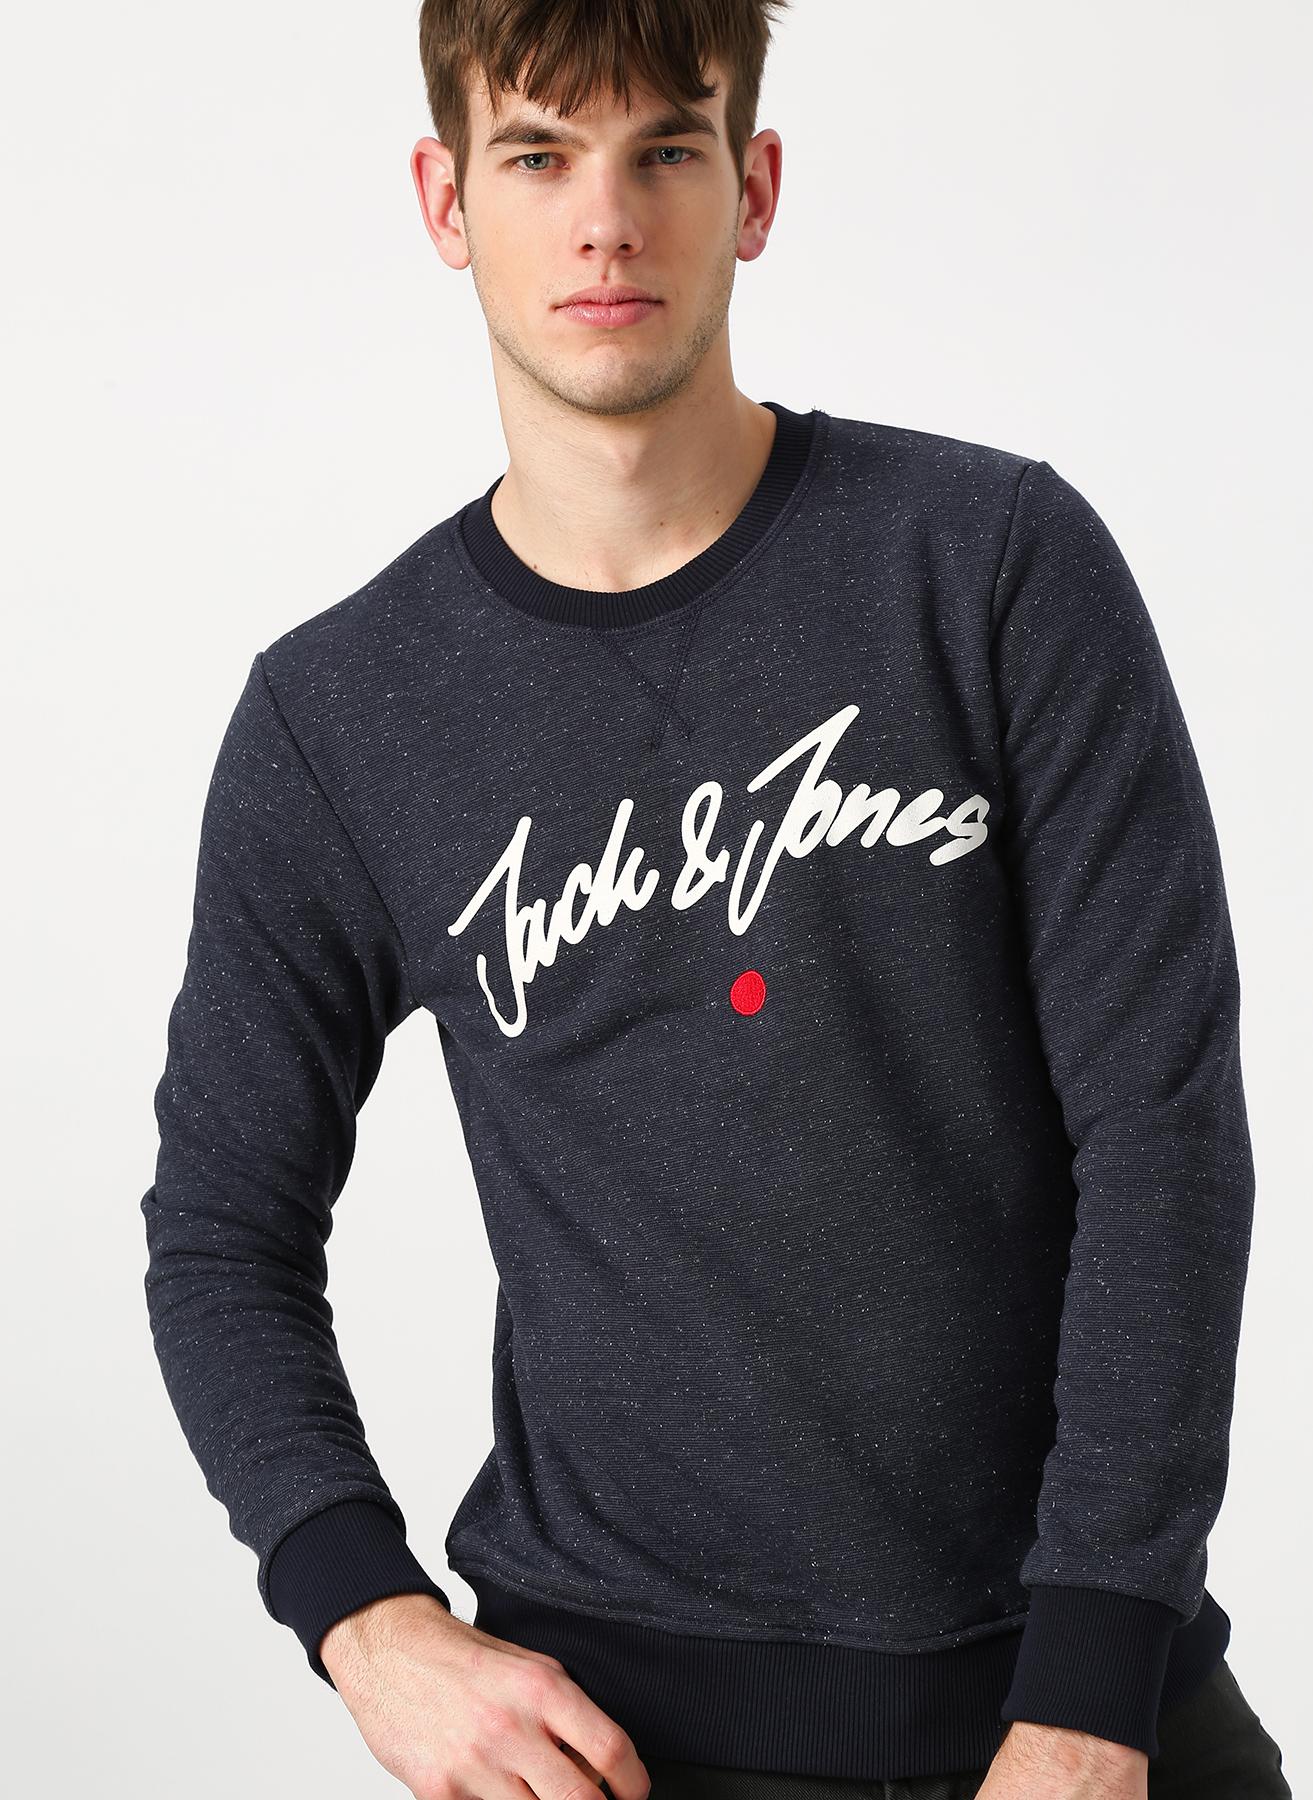 Jack & Jones Original Sweatshirt XL 5002361373004 Ürün Resmi